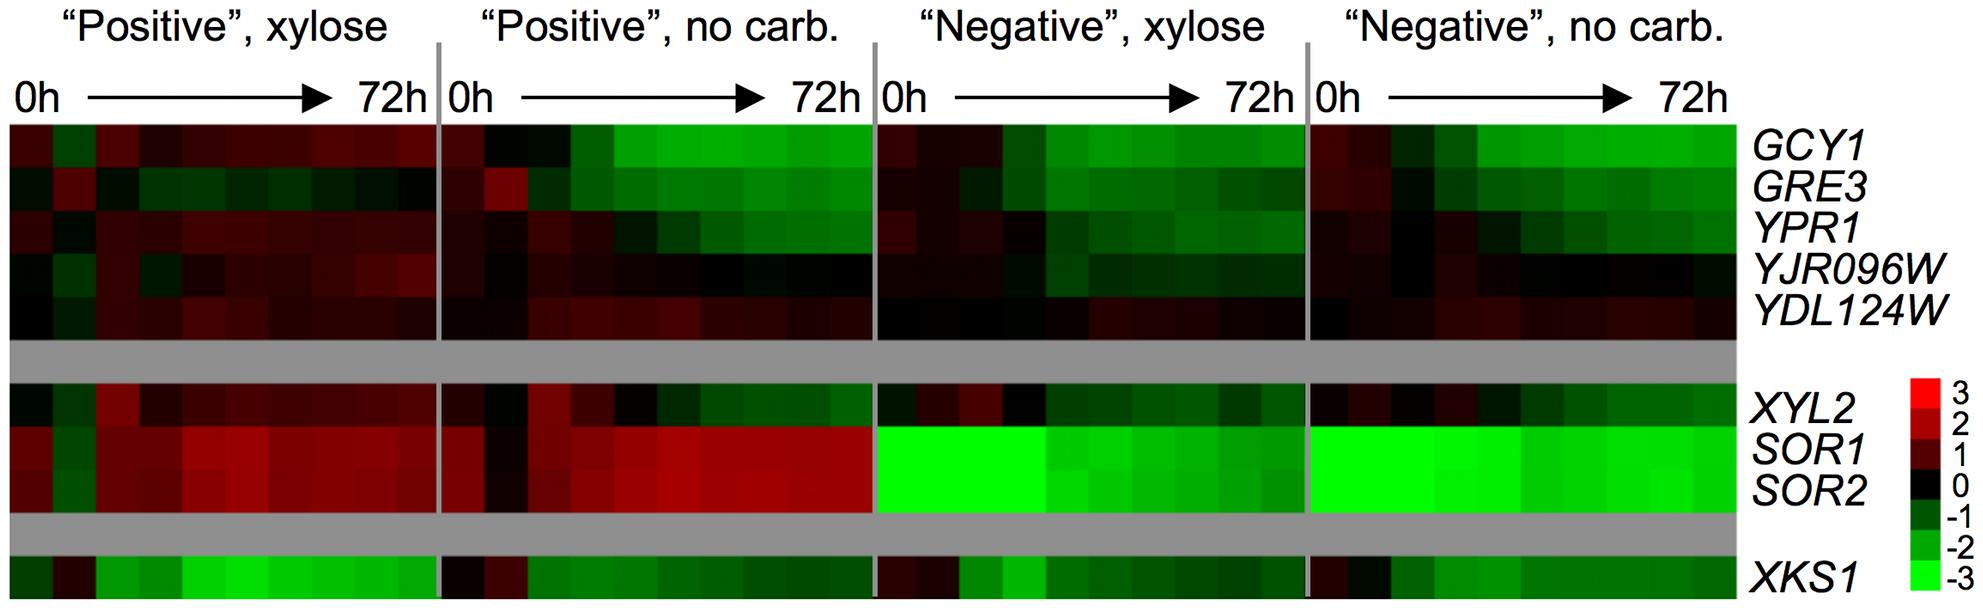 Endogenous xylose pathway gene expression.